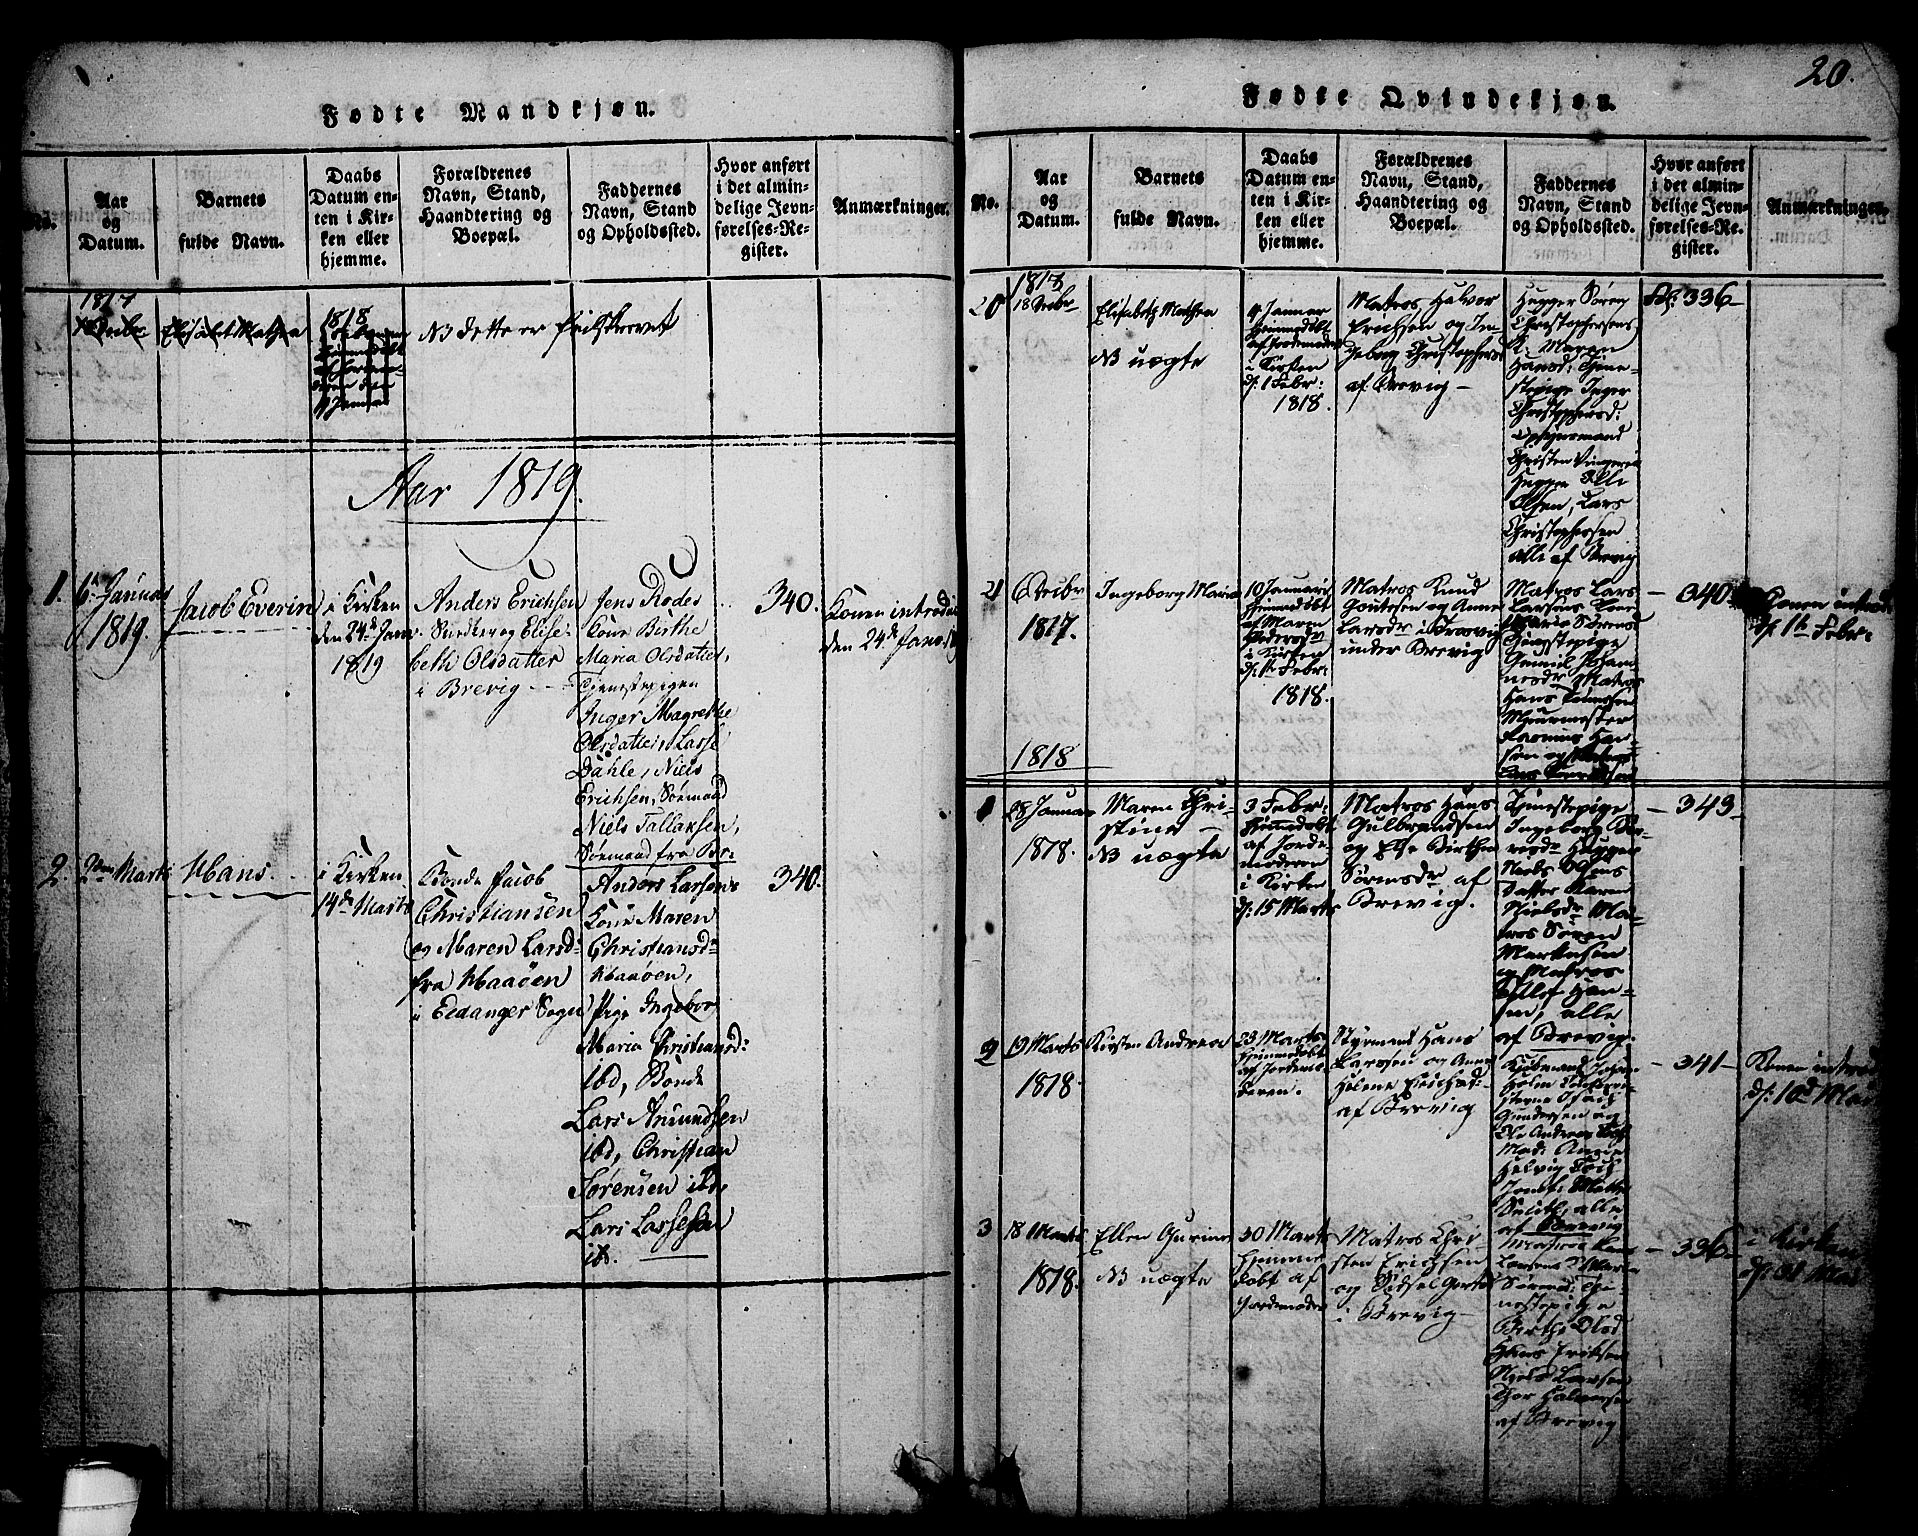 SAKO, Brevik kirkebøker, G/Ga/L0001: Klokkerbok nr. 1, 1814-1845, s. 20